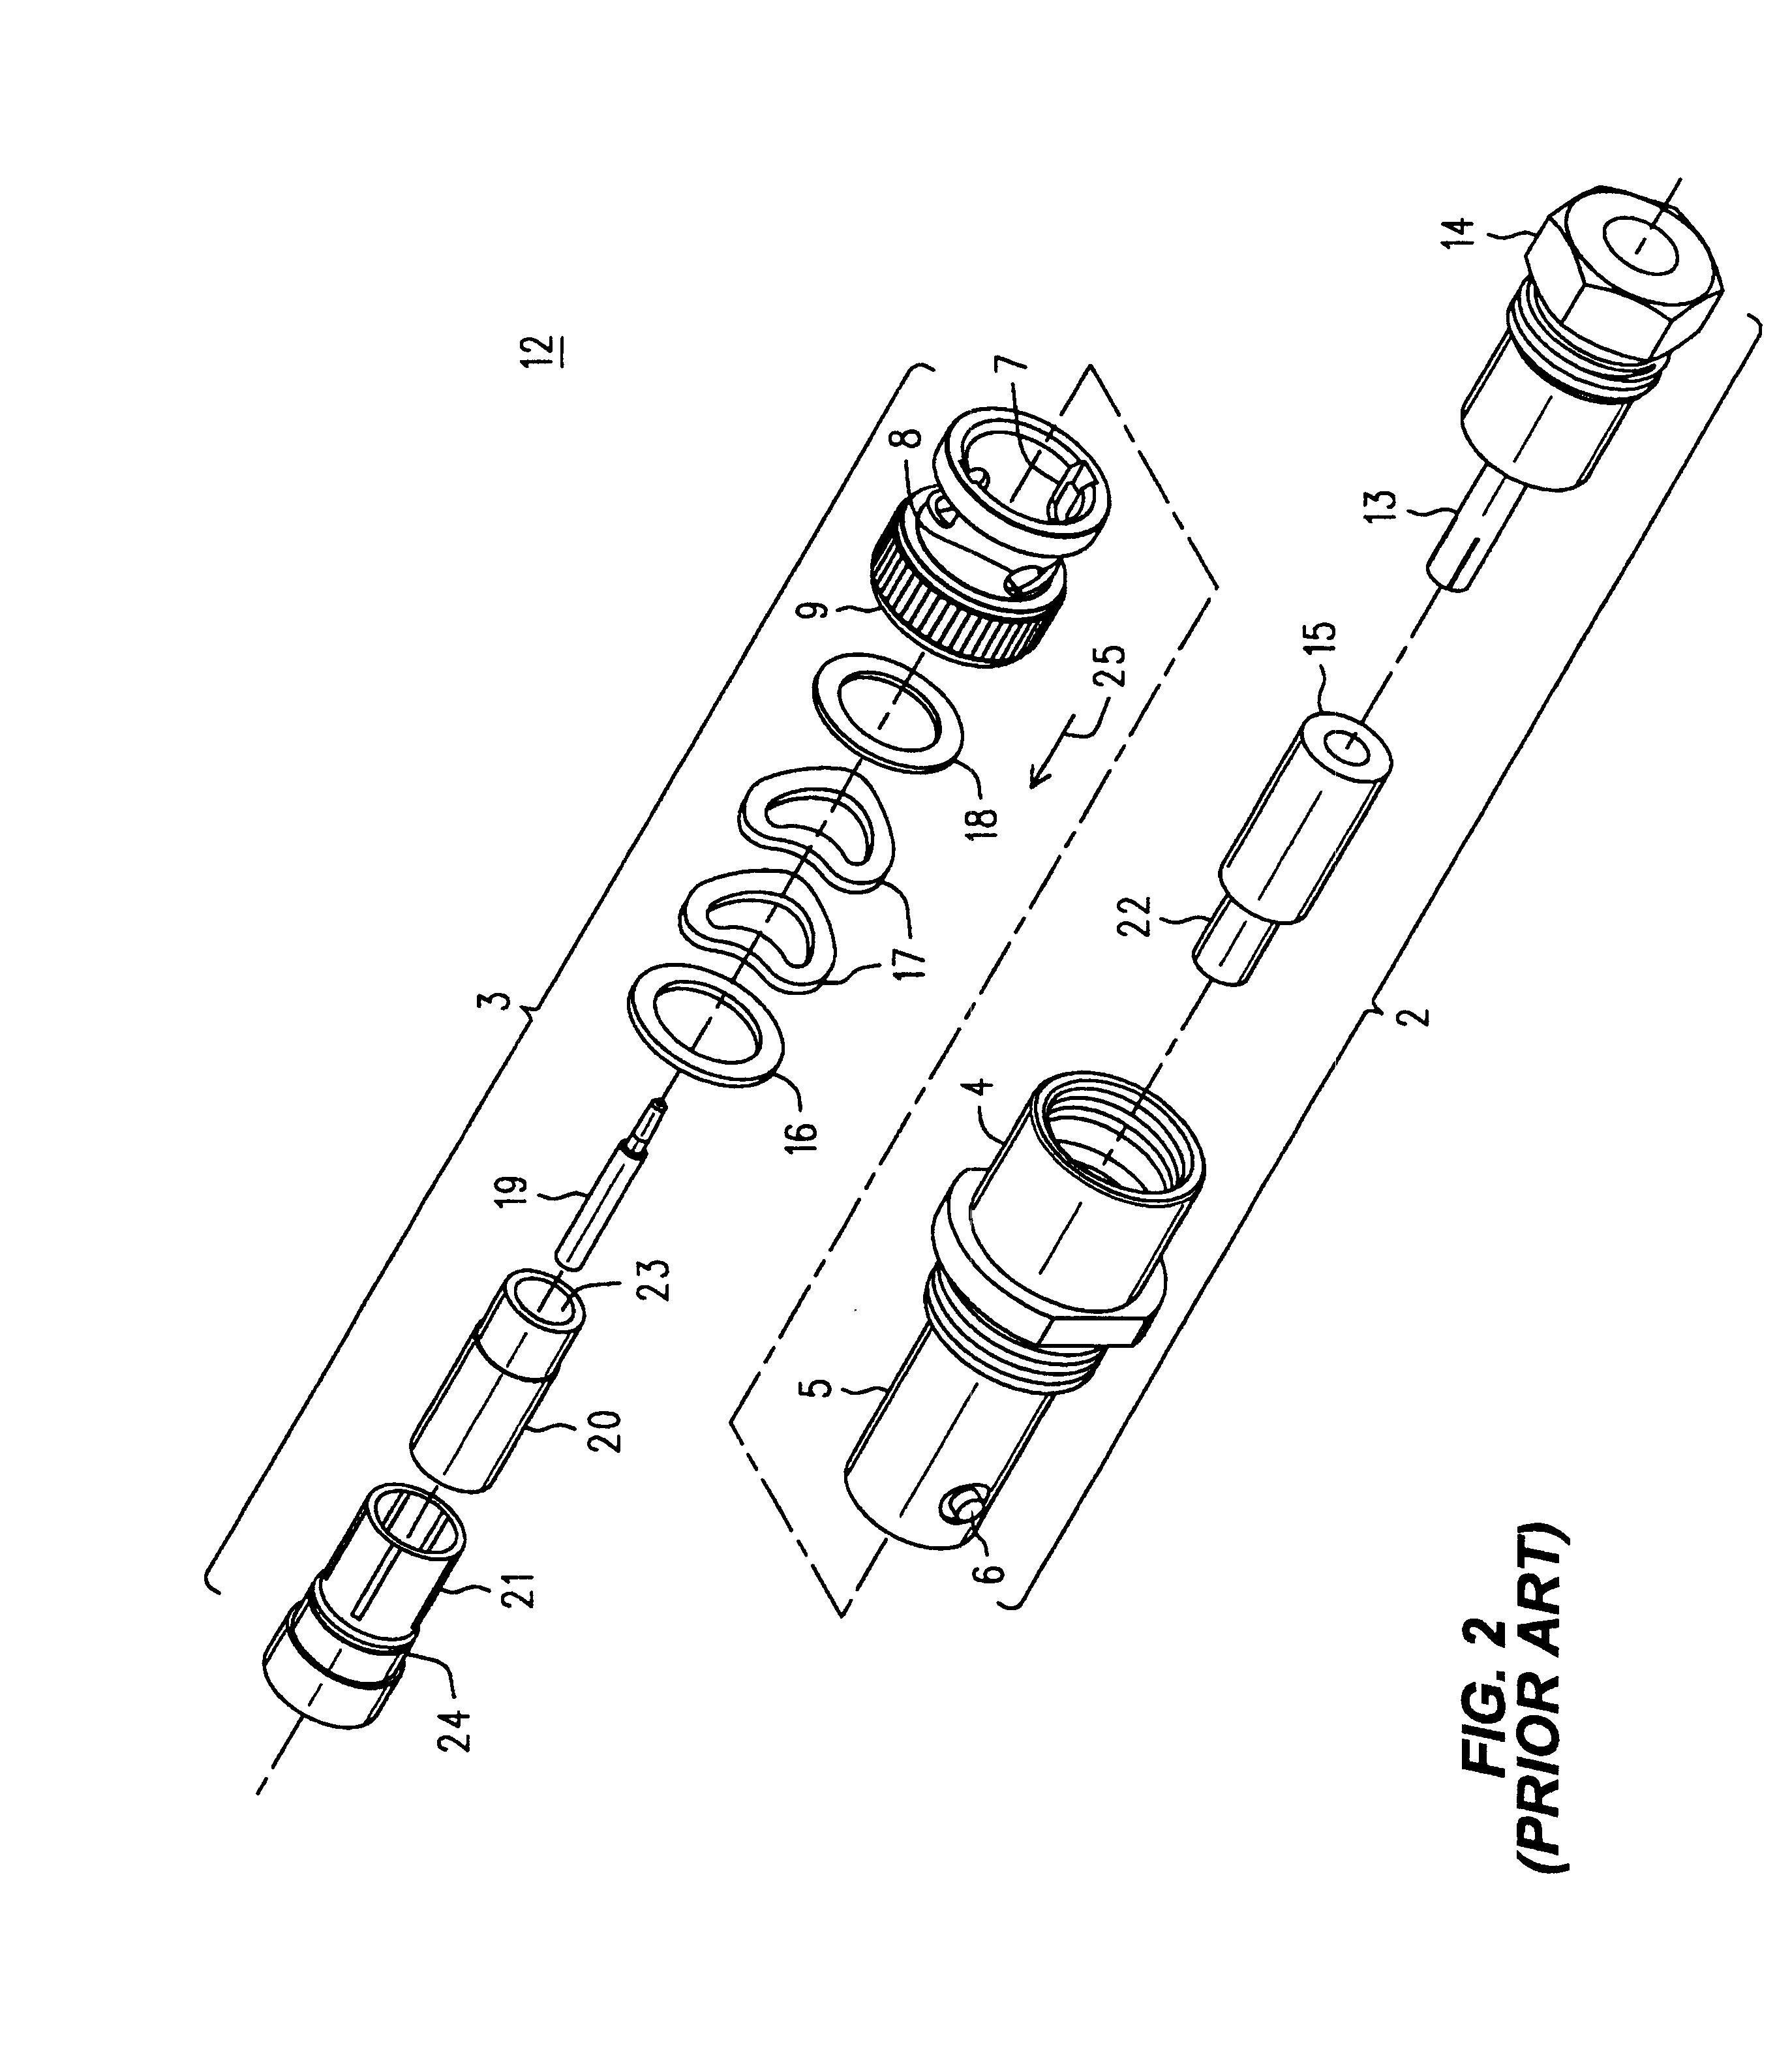 patent us6602093 - precision bnc connector